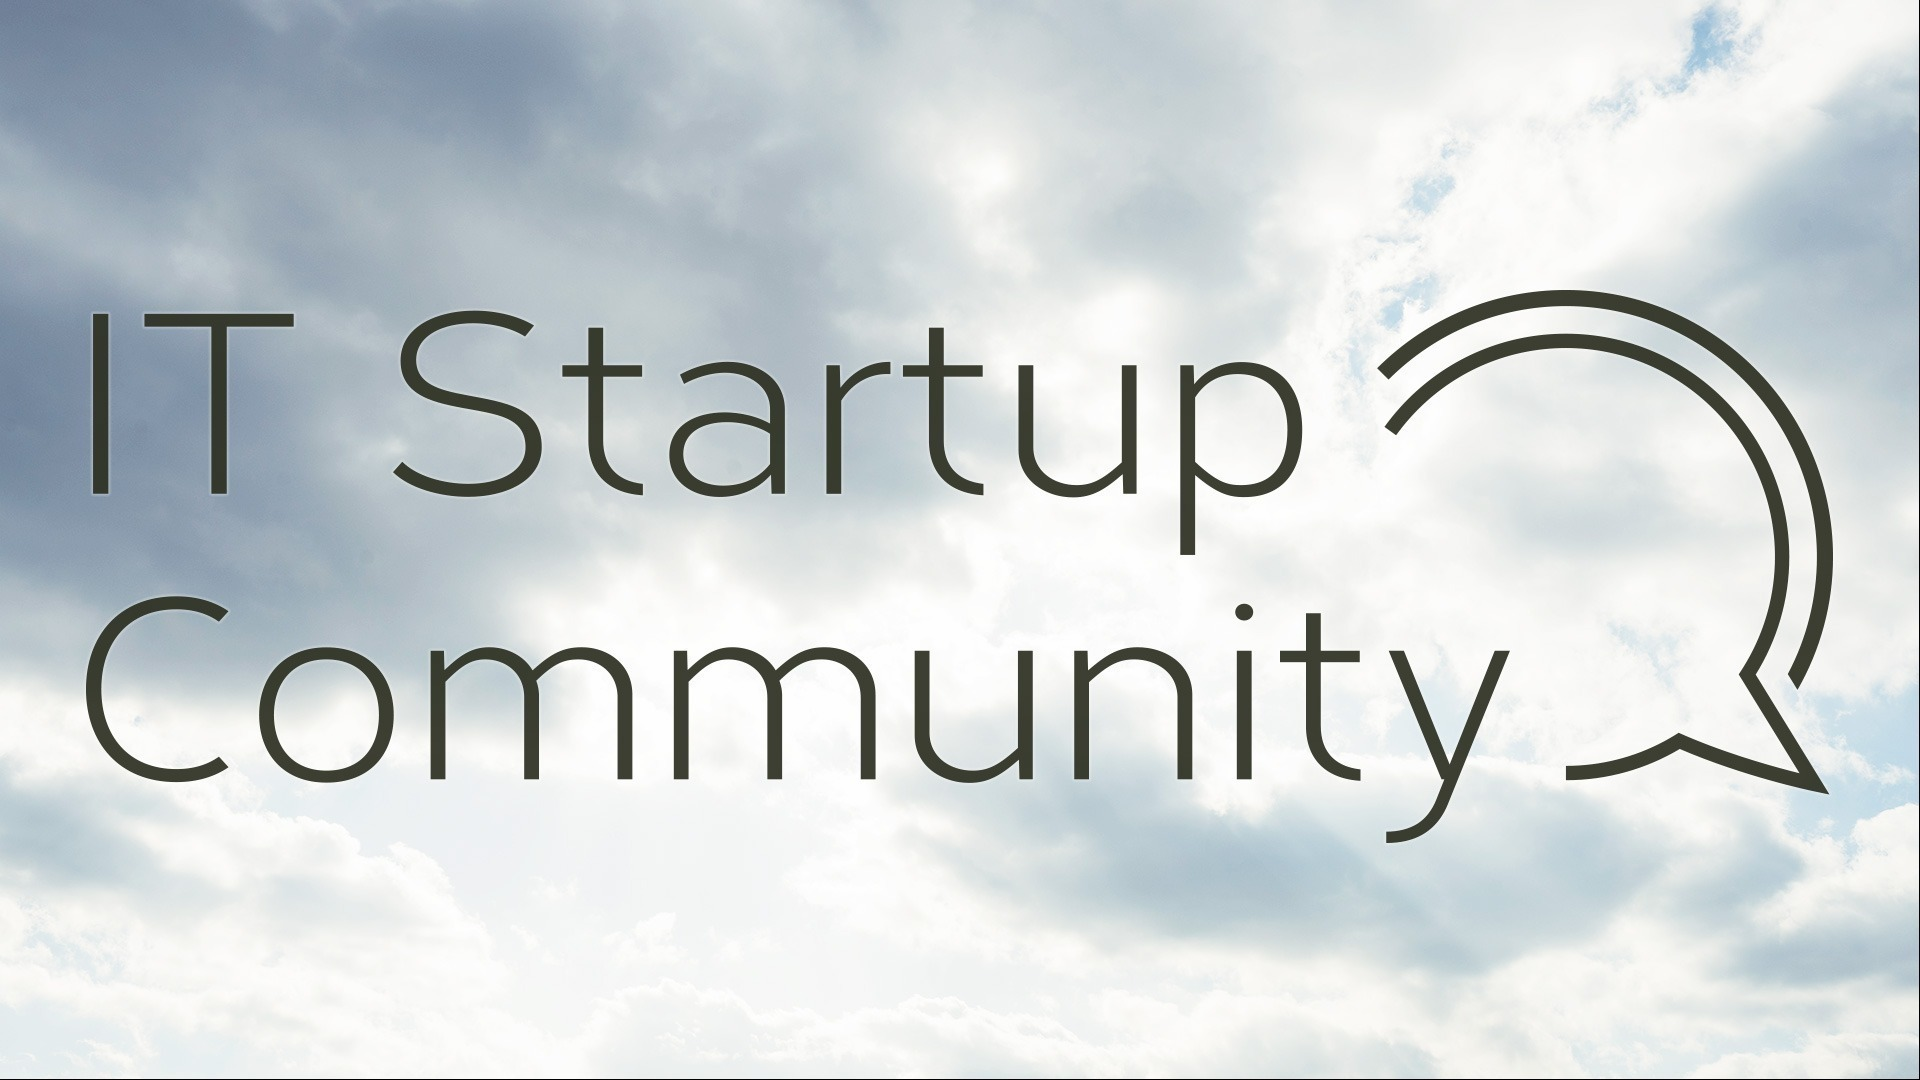 IT Startup Community